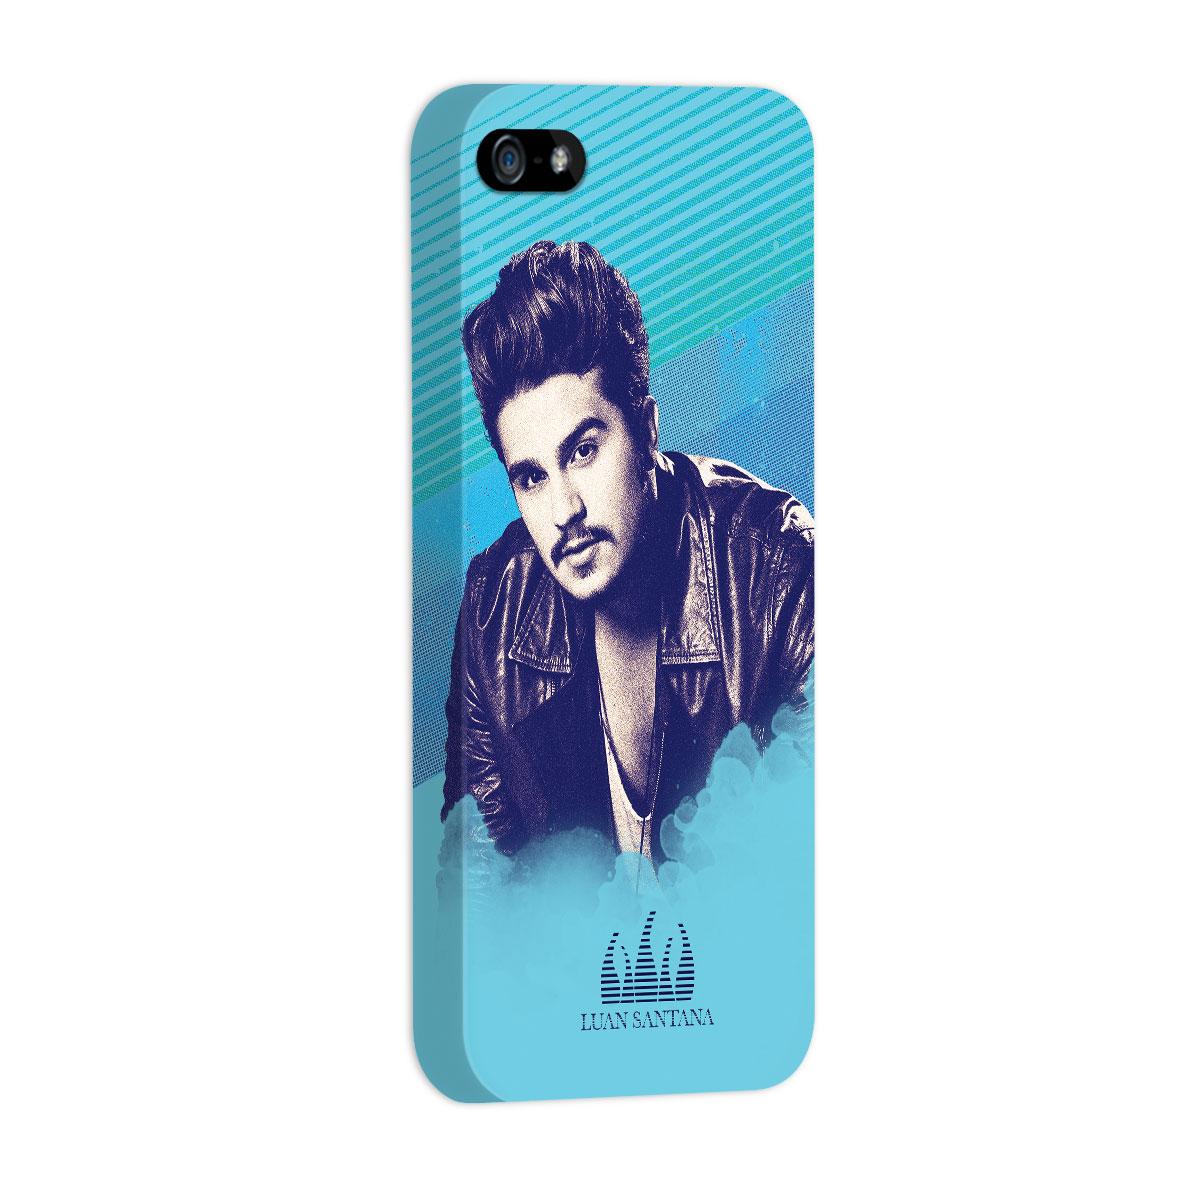 Capa iPhone 5/5S Luan Santana Sky